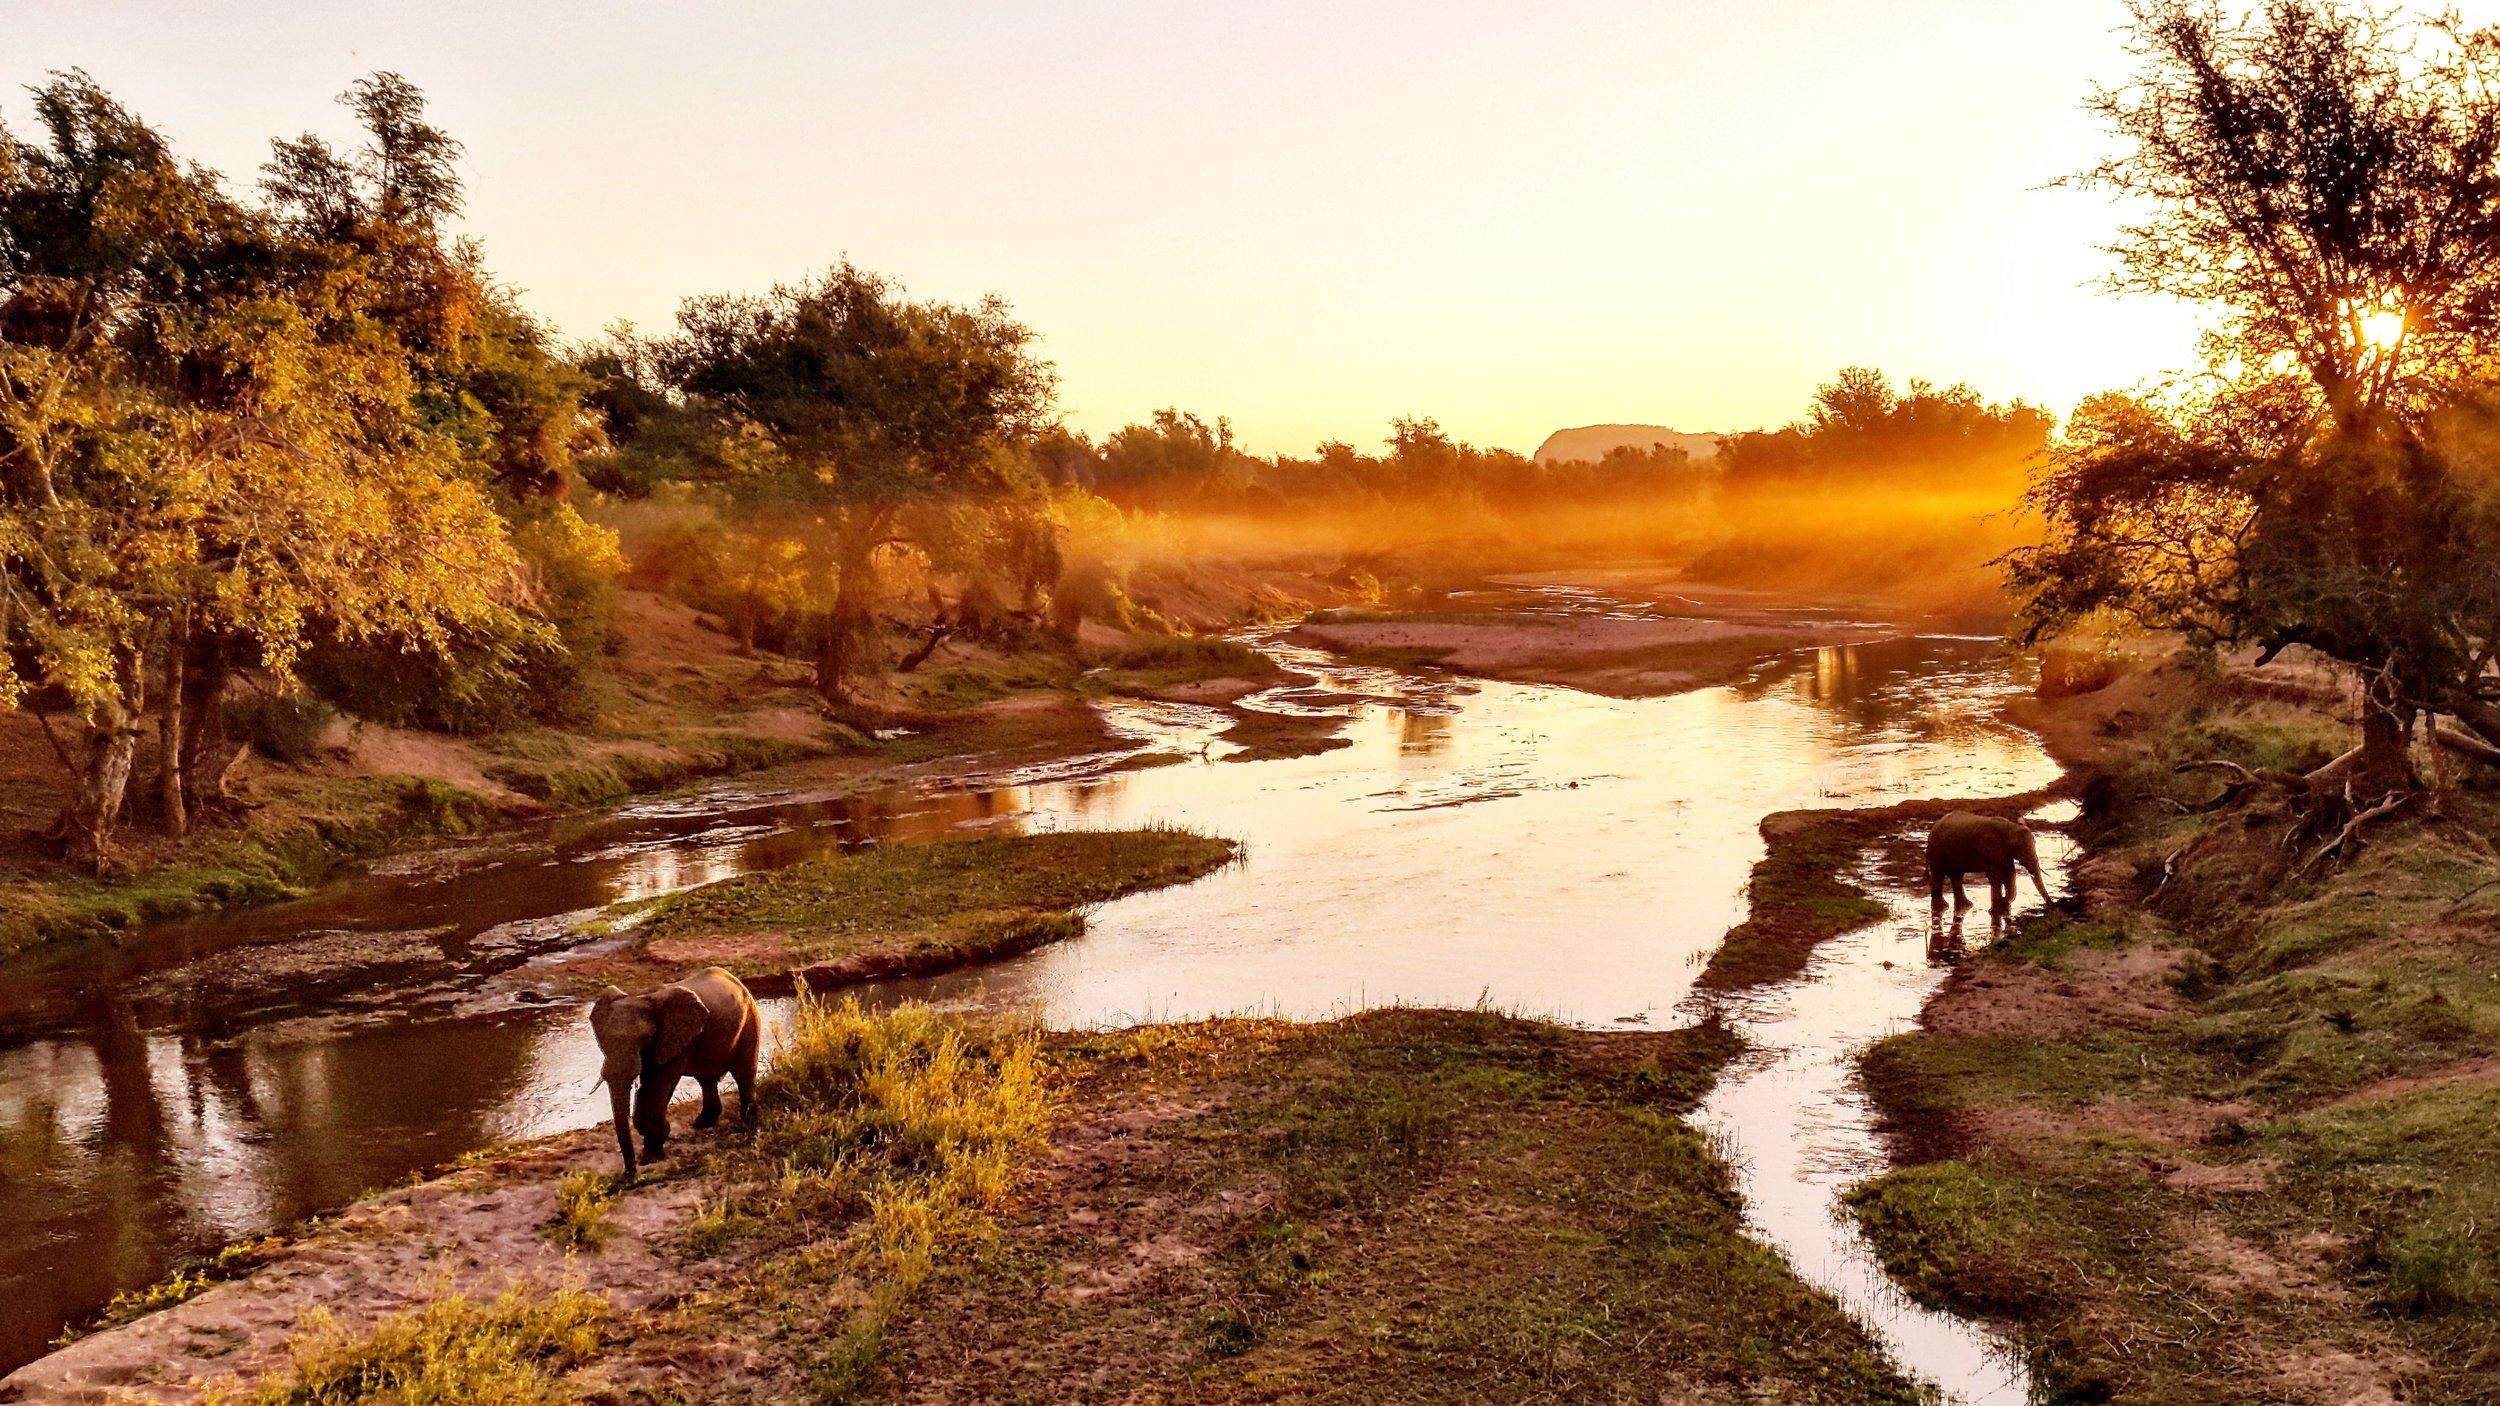 GOLDEN BULLS: Winter morning light at the bridge crossing the Luvuvhu River, a place that often holds hidden surprises.